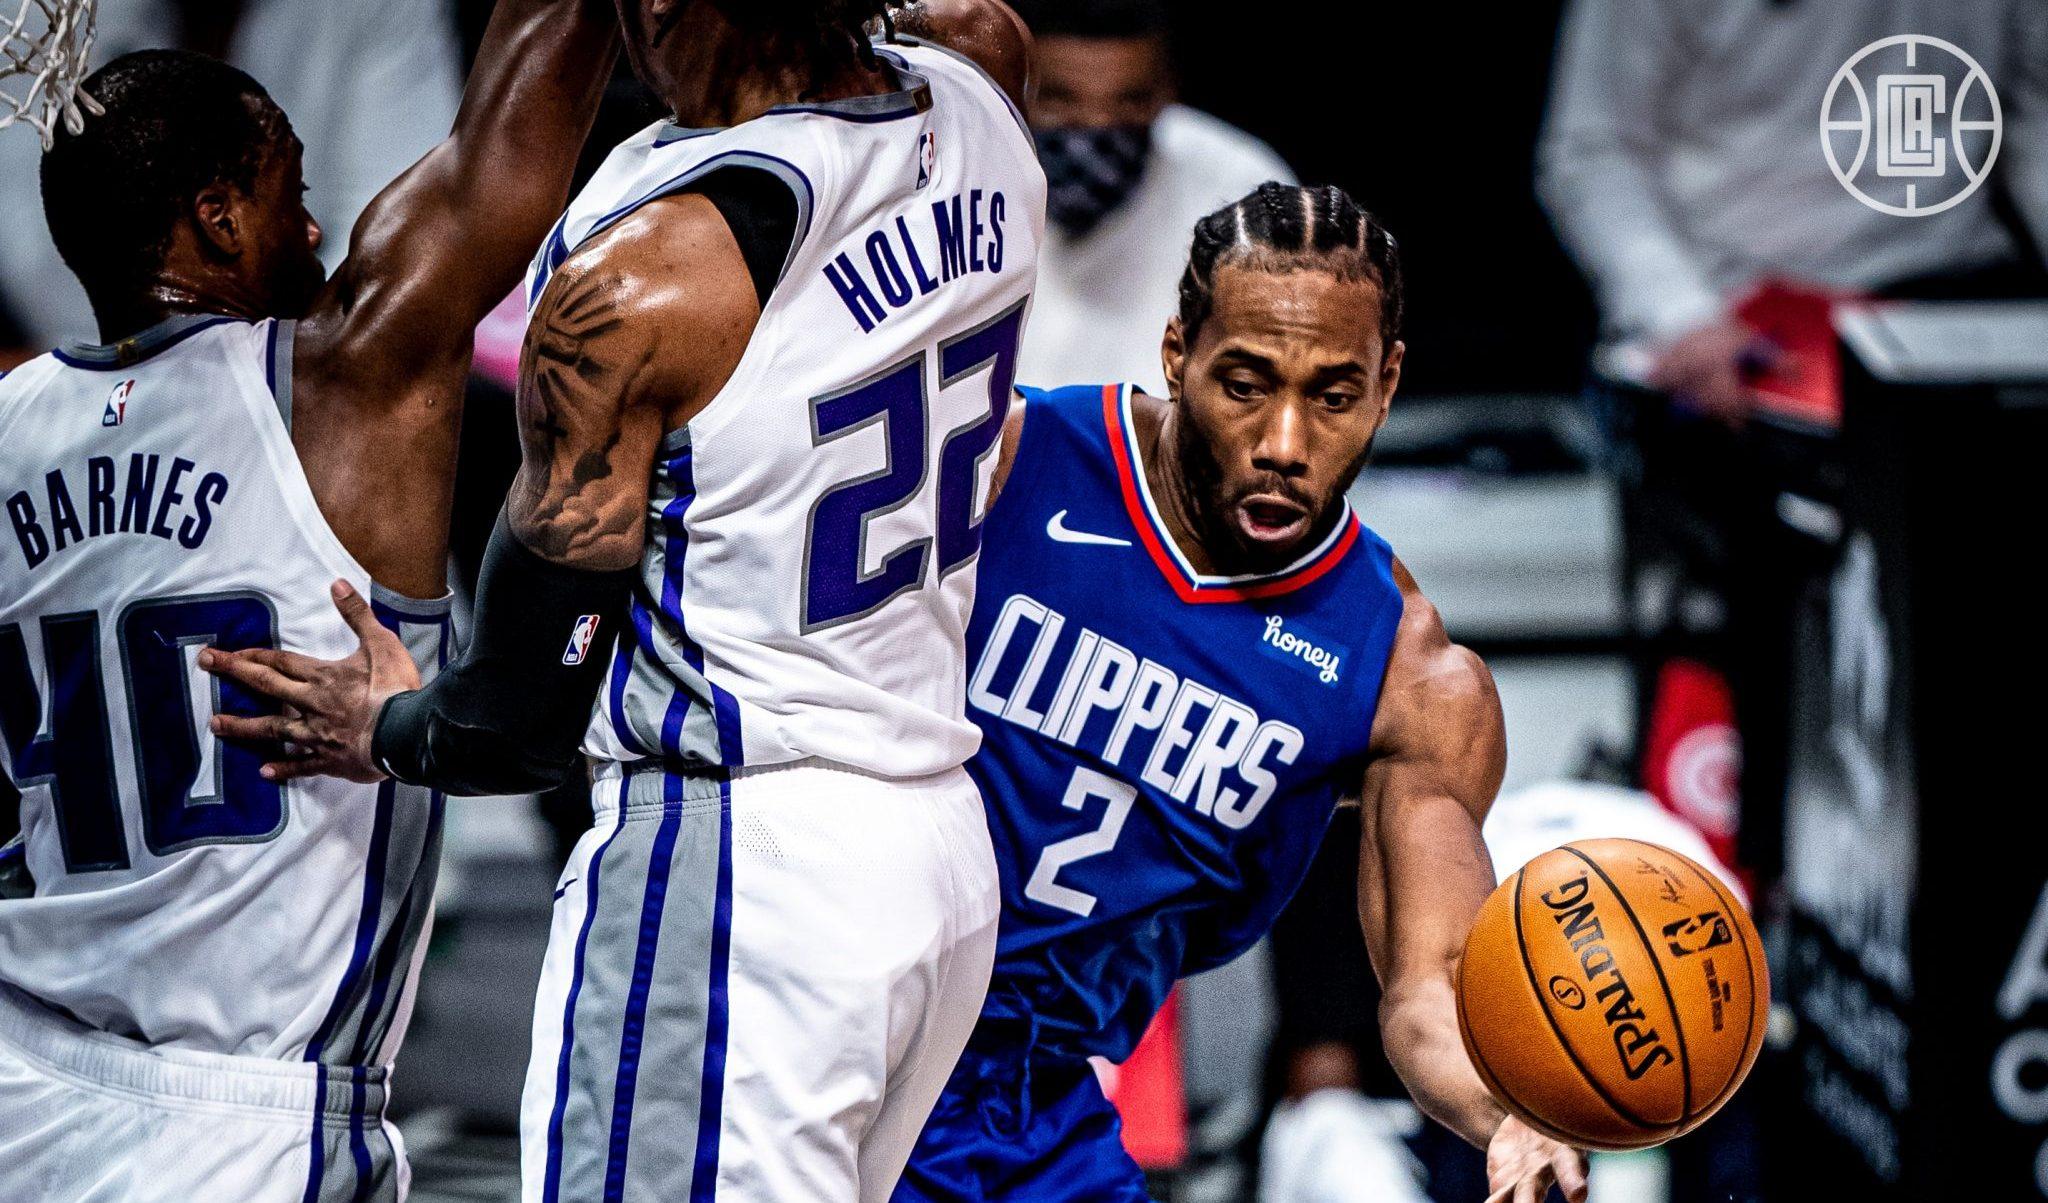 Clippers vs. Kings 2022 Preseason Game Preview